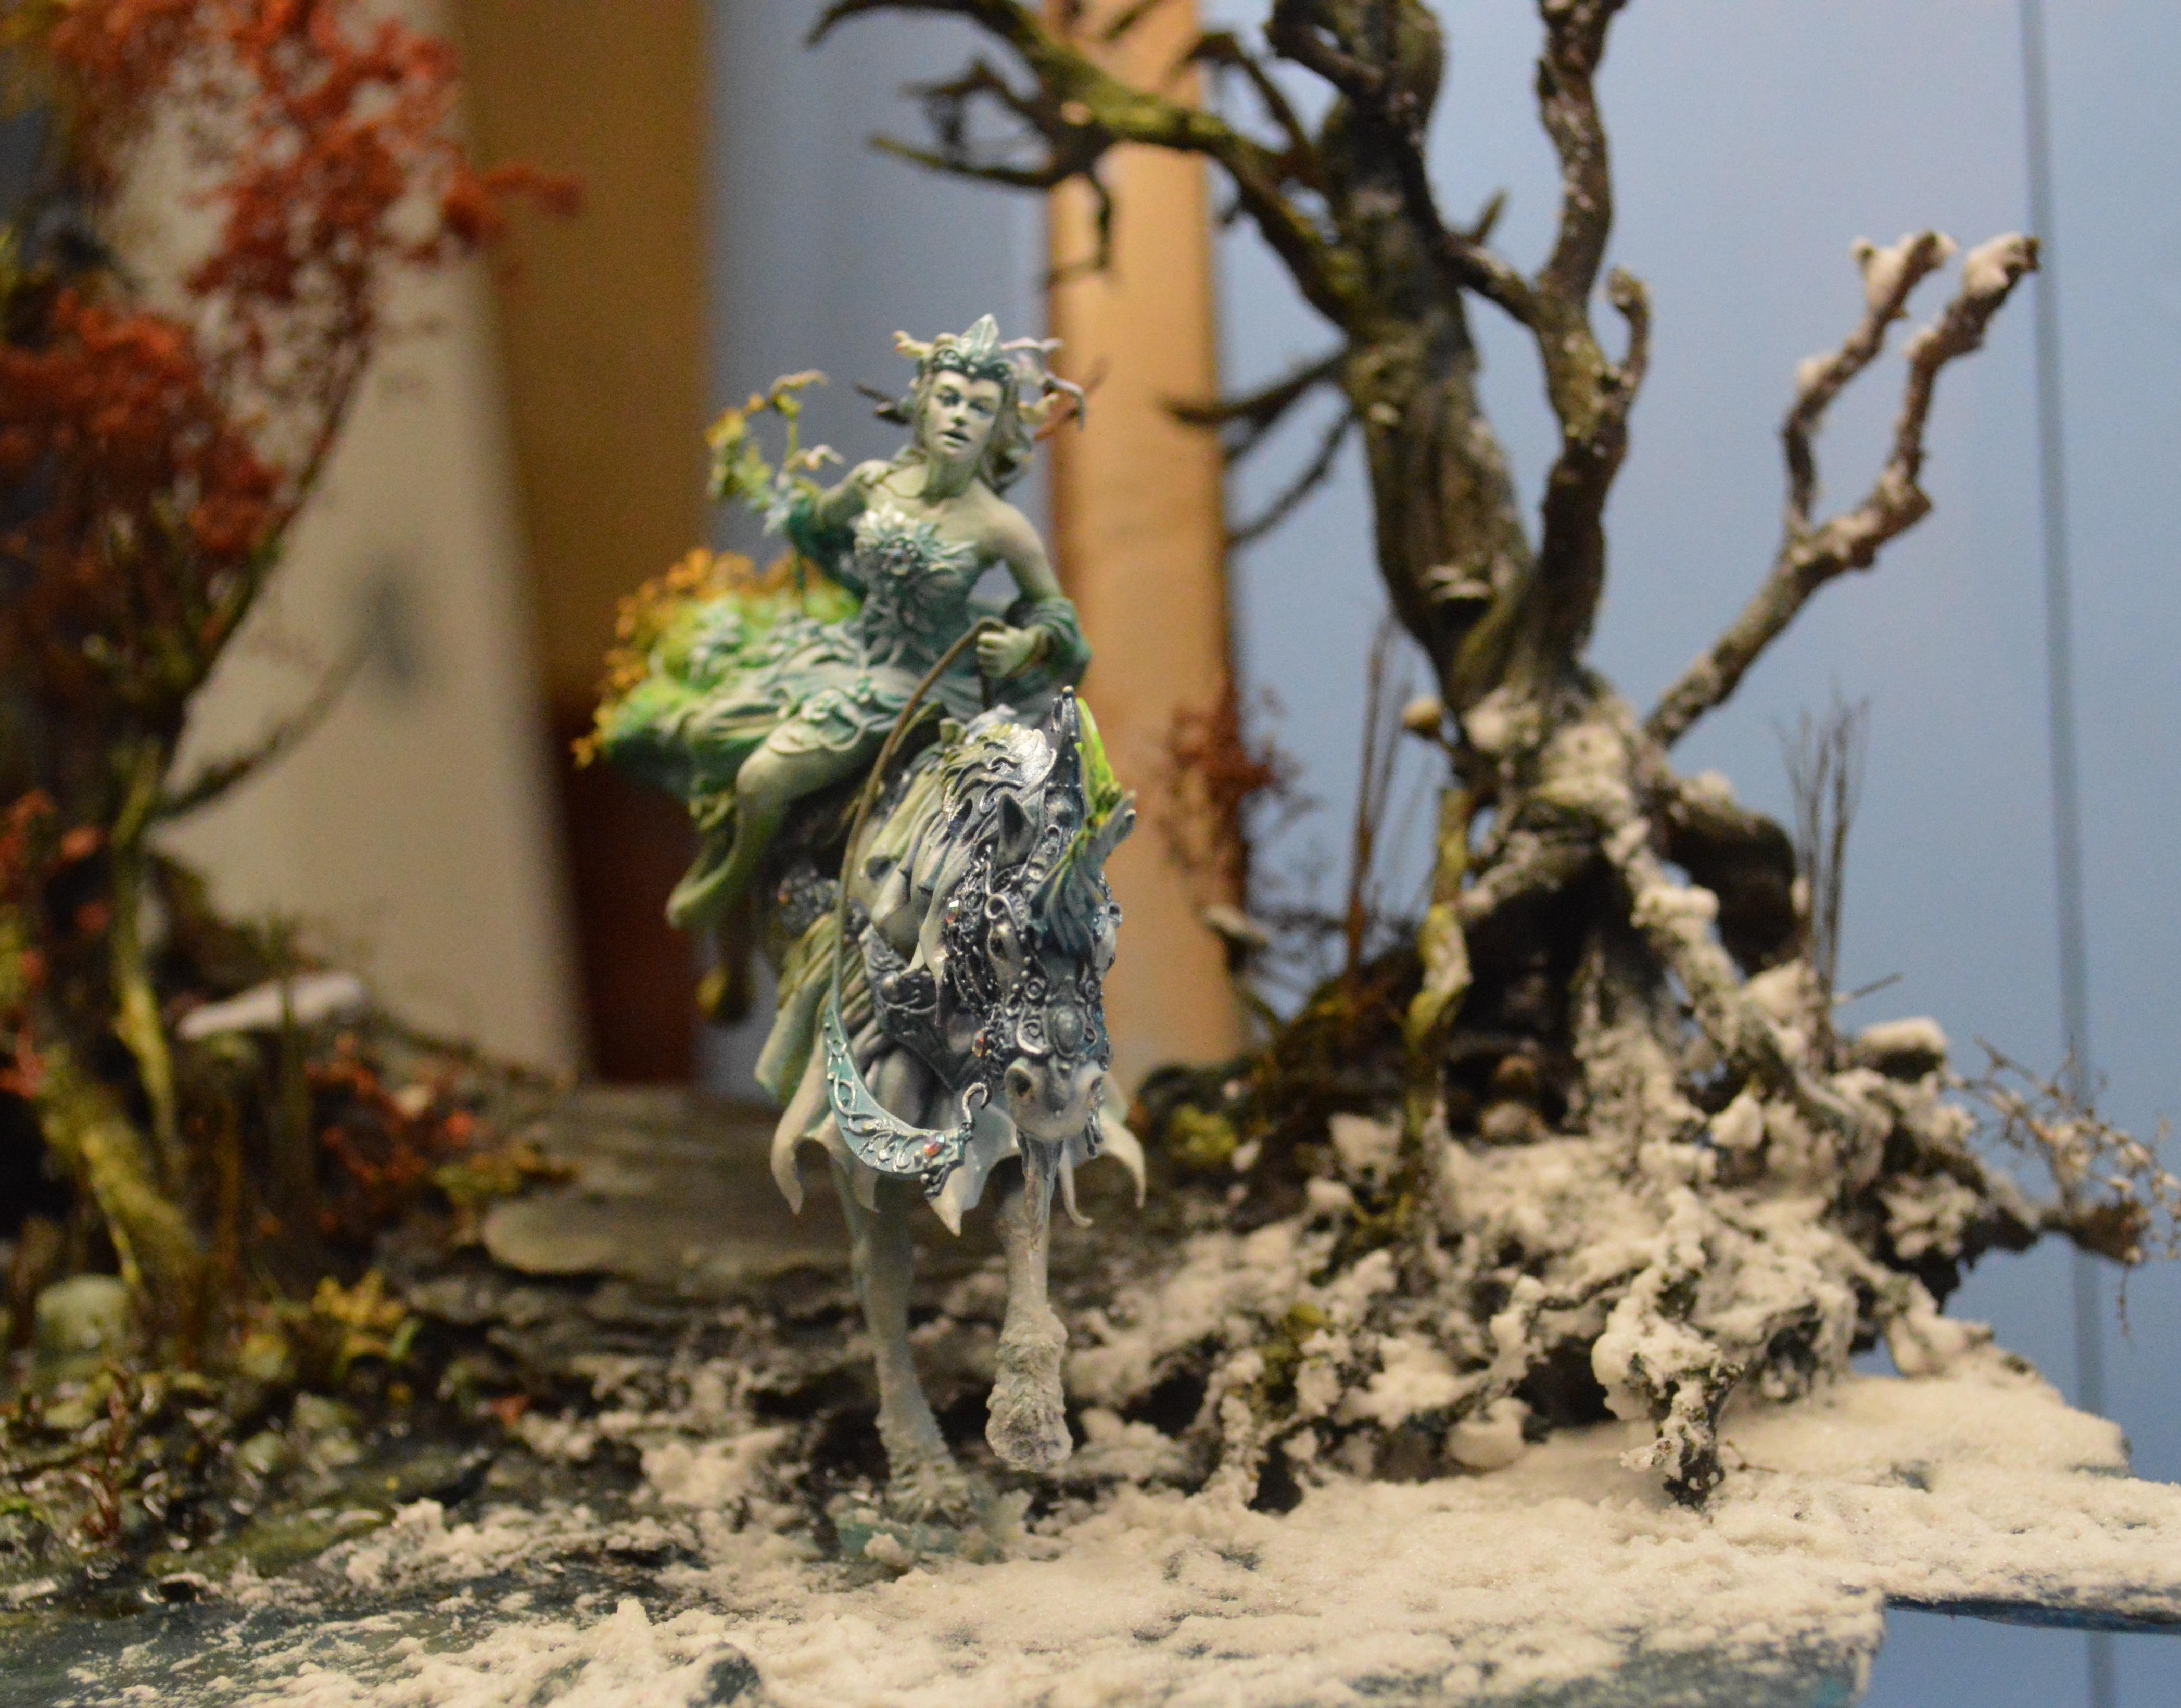 Adepticon 2014, Crystal Brush, Diorama, Female, Wood Elves